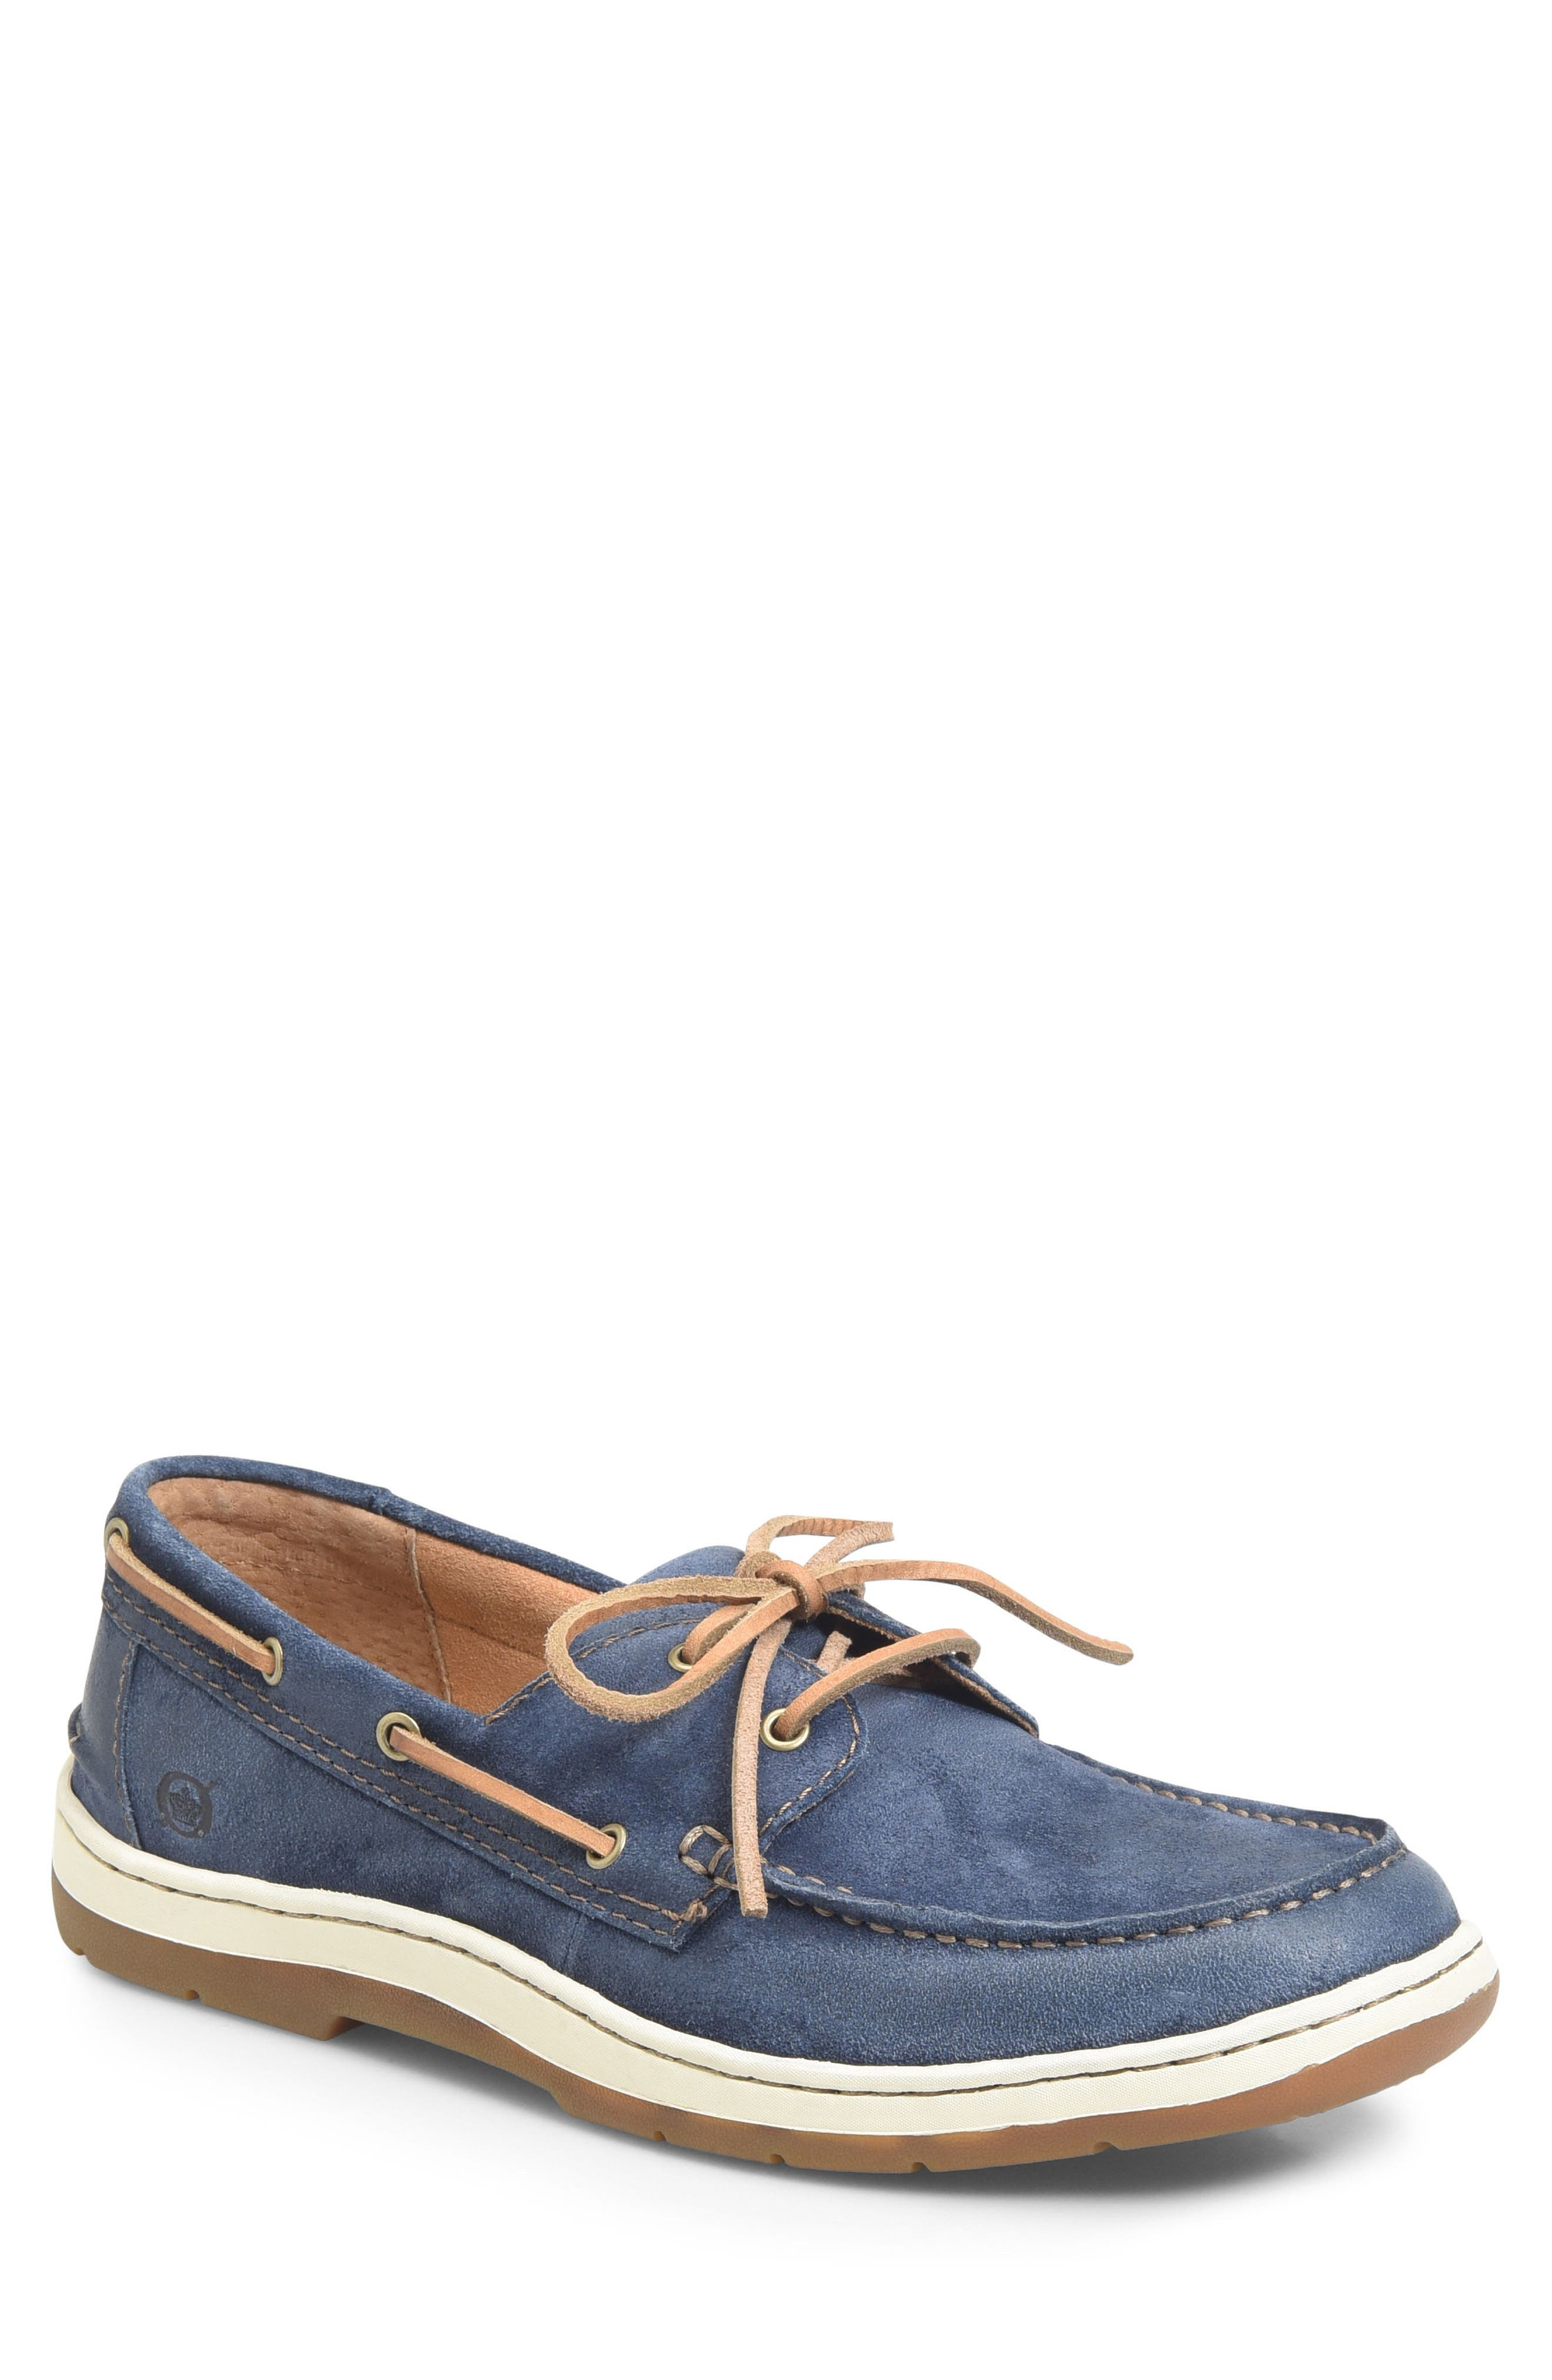 Ocean Boat Shoe,                         Main,                         color, Dark Blue Leather